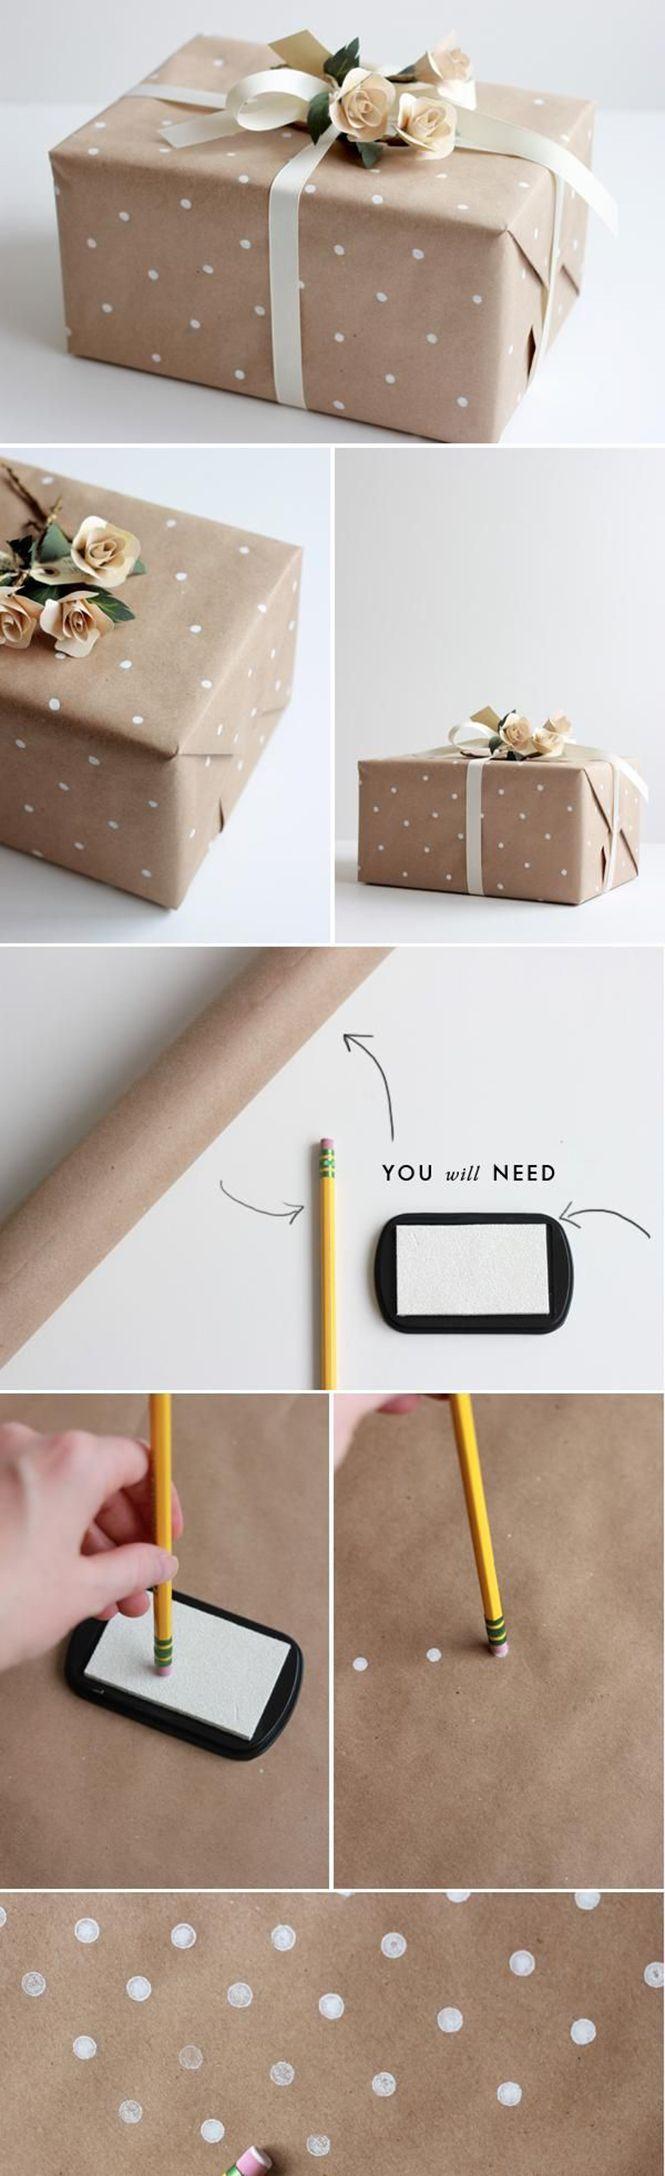 Easy DIY gift wrapping ideas for this festive season a Ciao, sono Anna . Visita il mio blog / Hi, I'm Anna . Check out my blog / perteche.wordpress.com